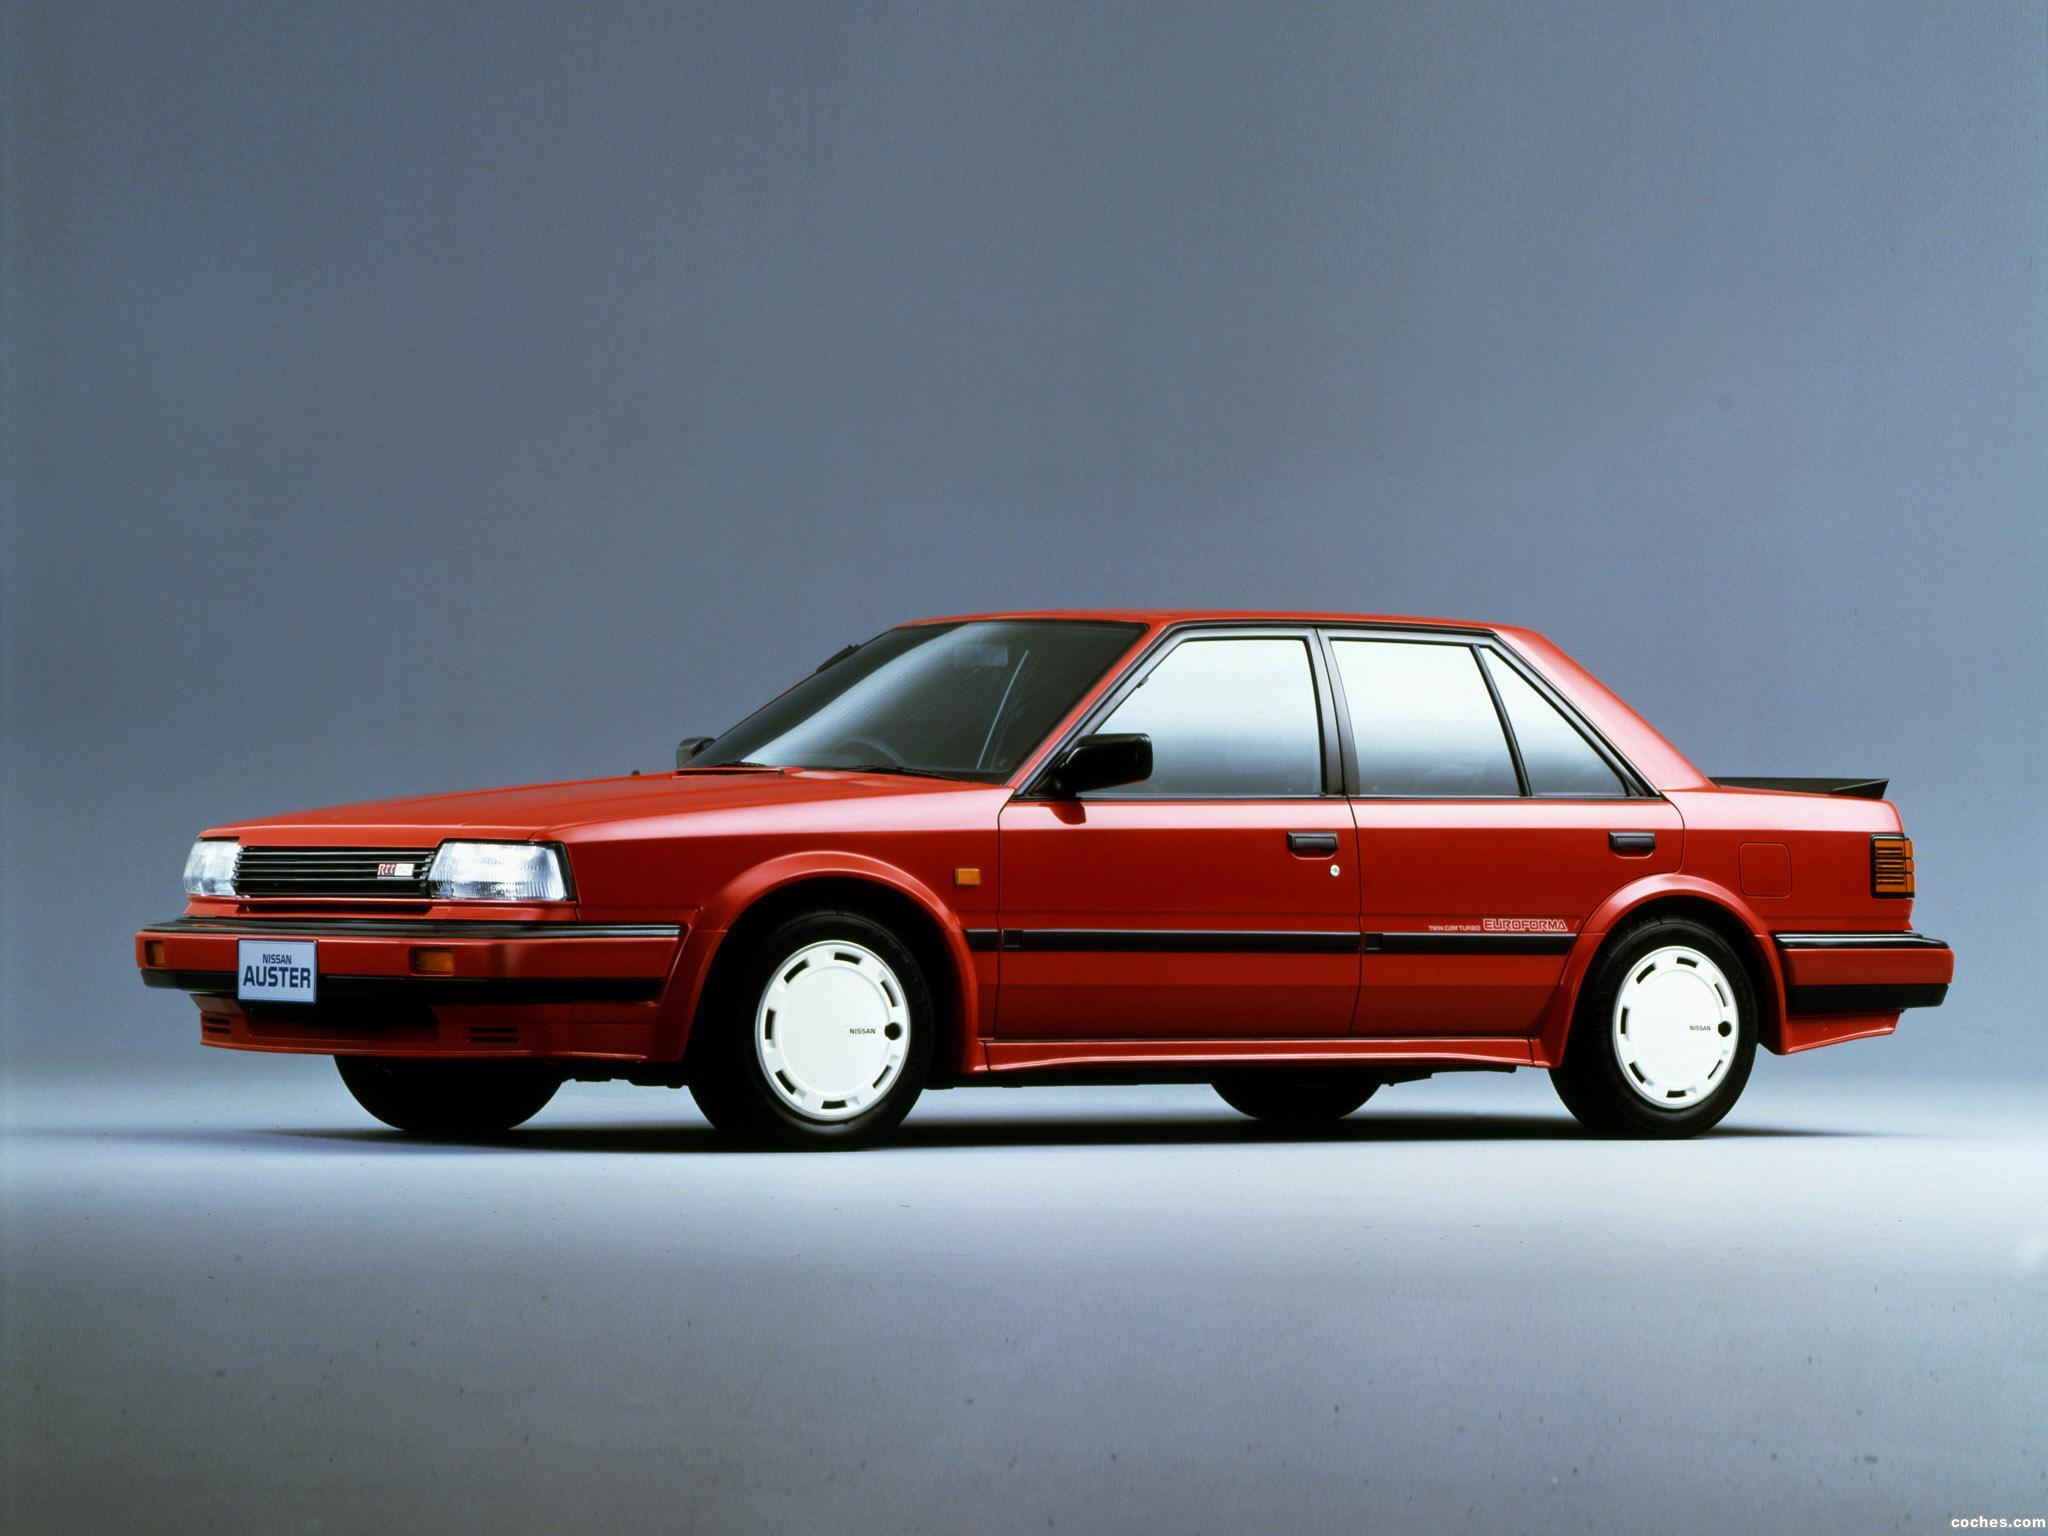 Foto 0 de Nissan Auster RTT Euroforma T12  1986